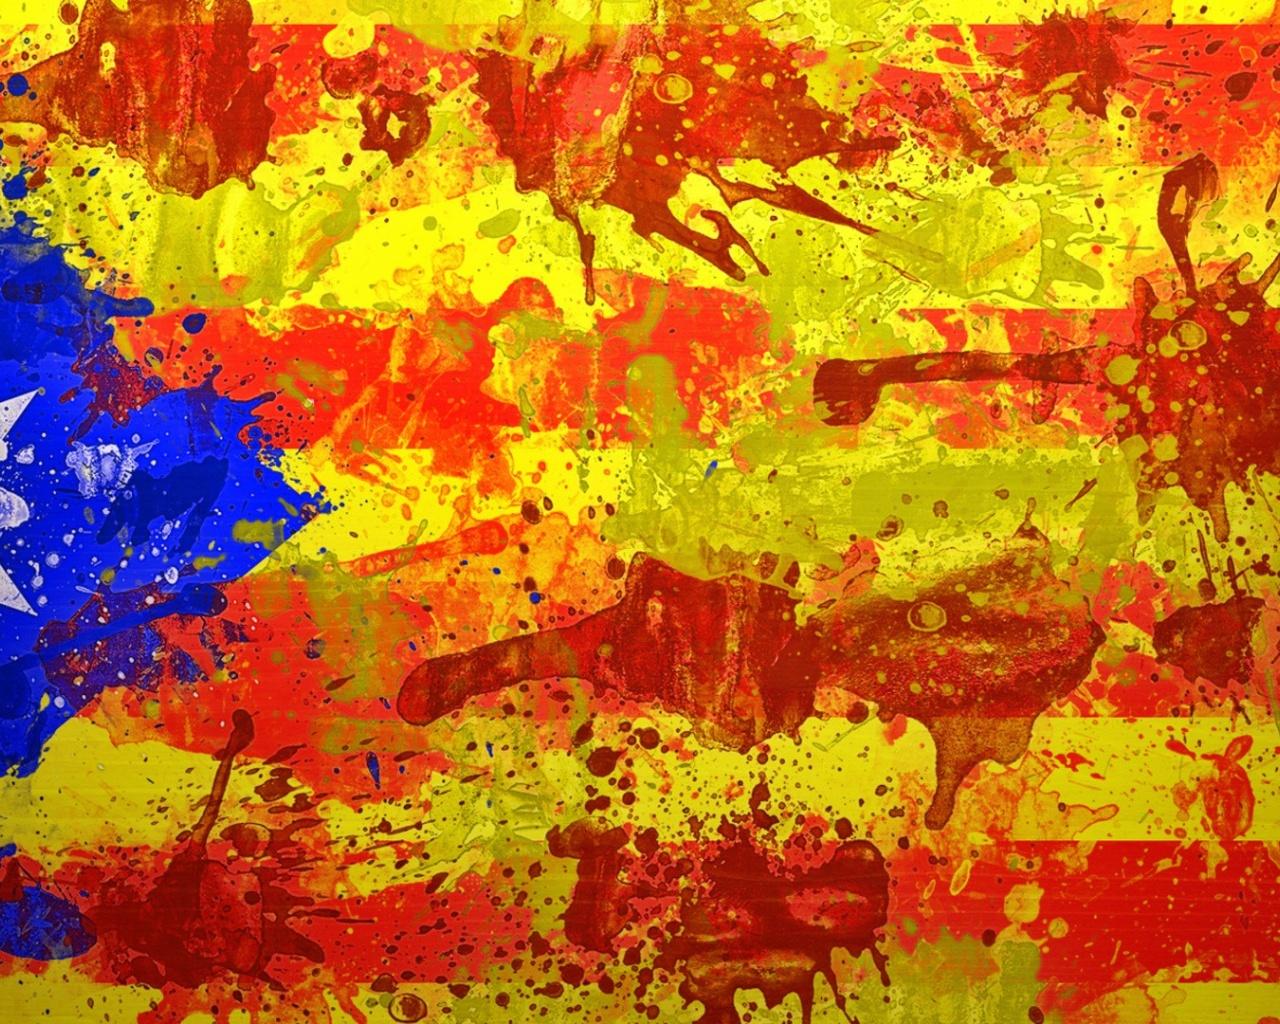 1280x1024 Catalan Flag desktop PC and Mac wallpaper 1280x1024